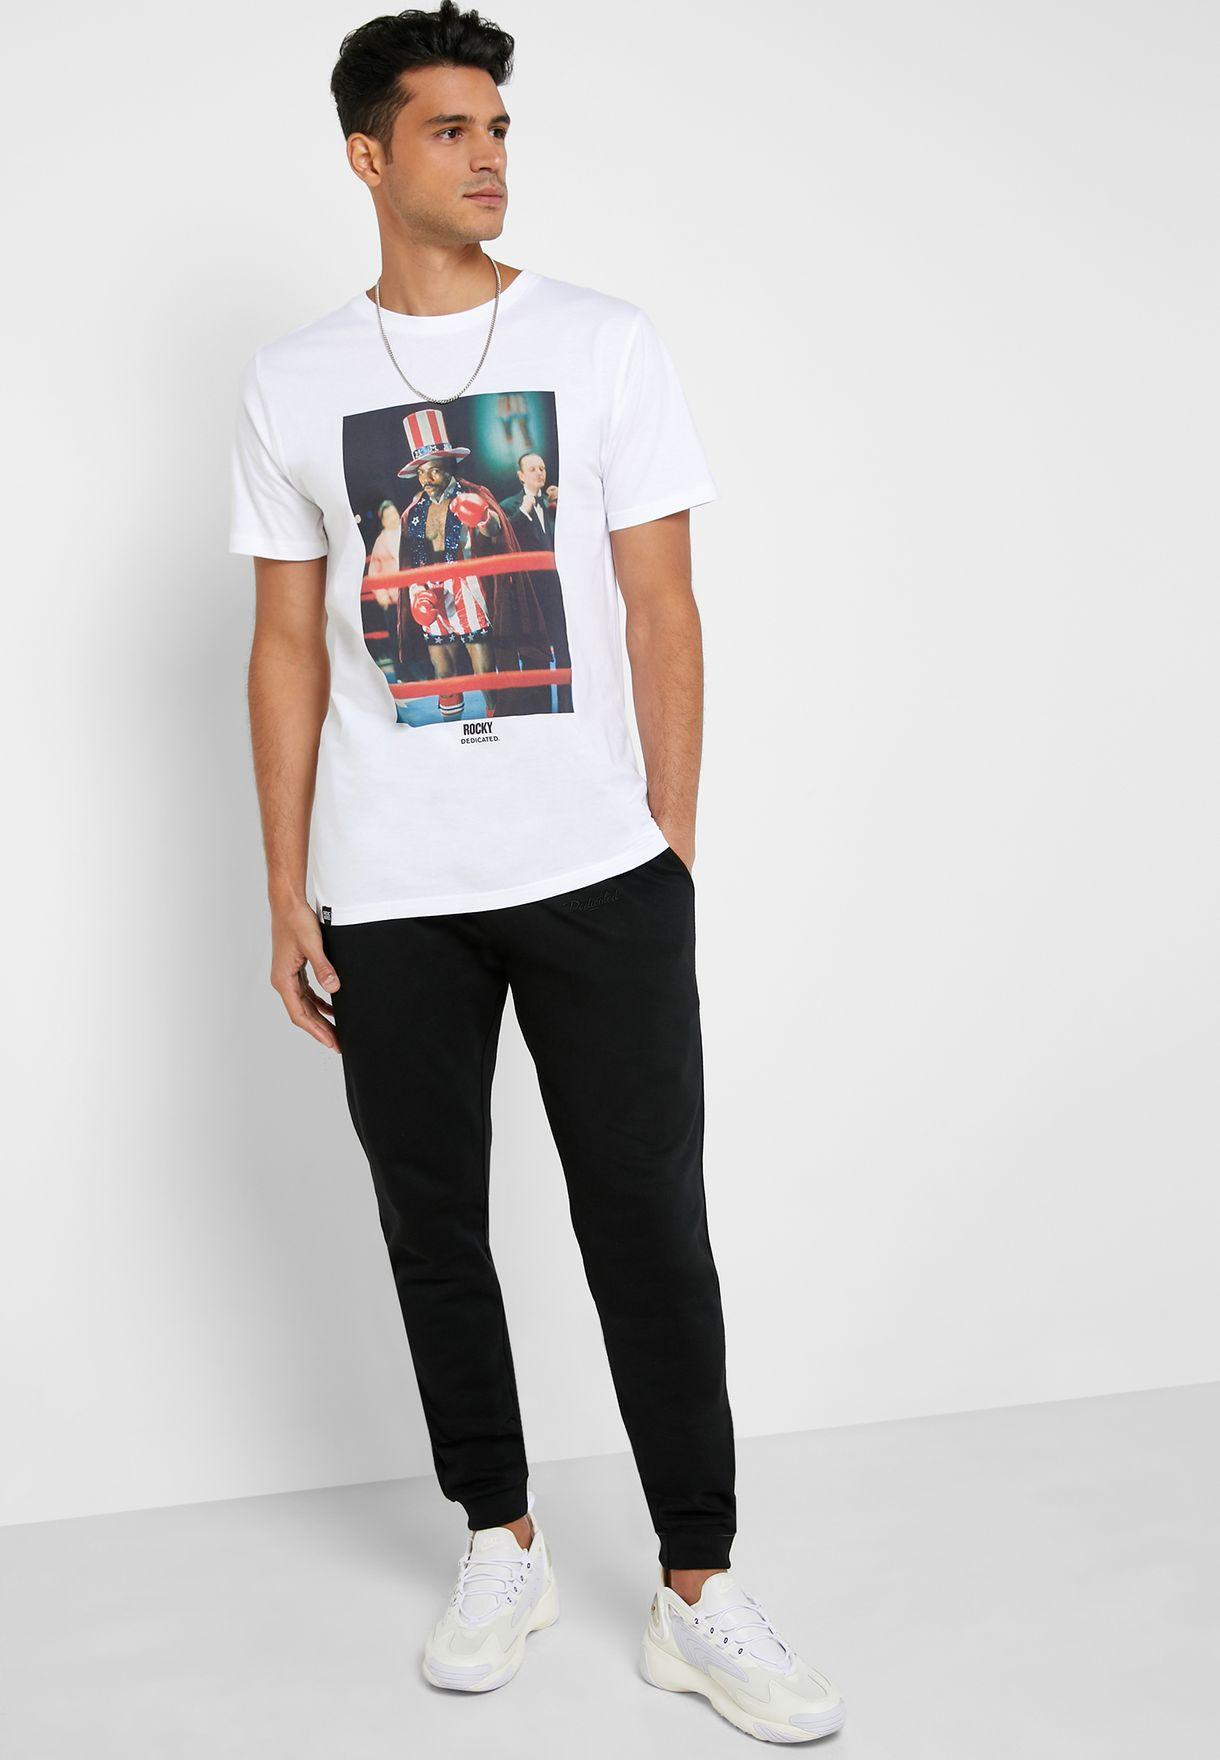 Stockholm Apollo Creed Crew Neck T-Shirt